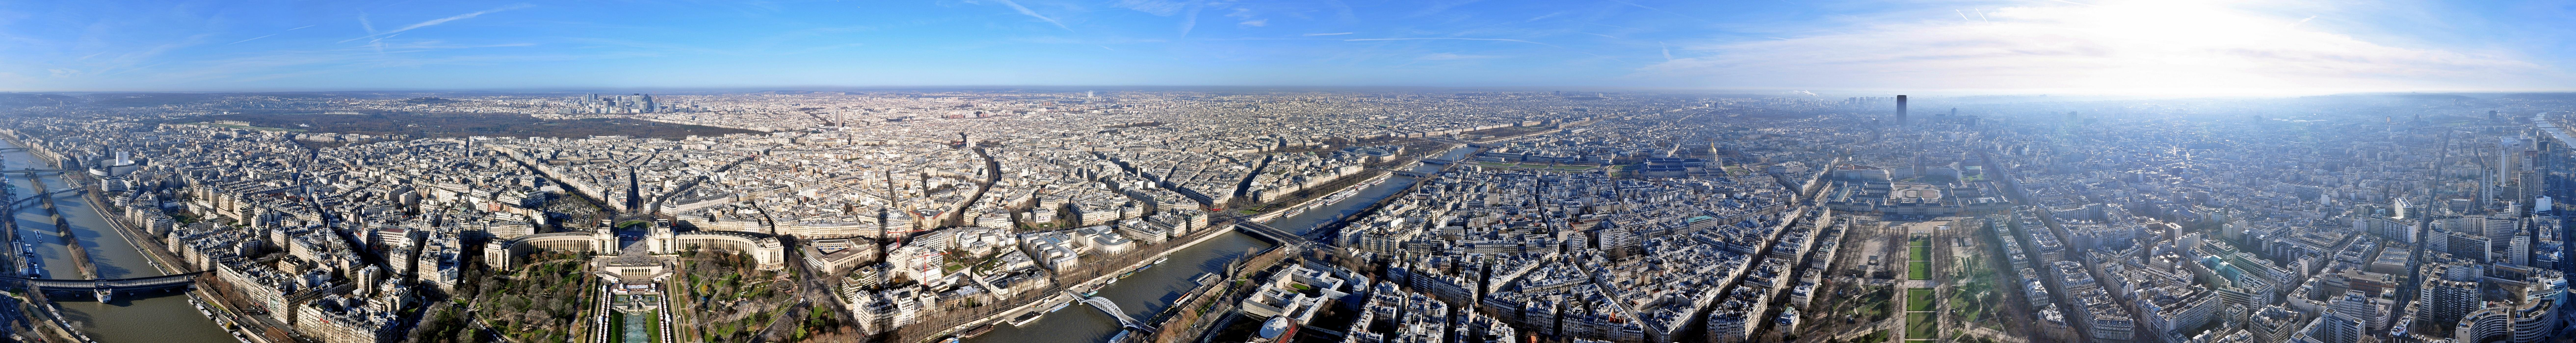 Heliavision 2093. • Complications. • Goacijaoon sit Kralewskovgradot Tour_Eiffel_360_Panorama